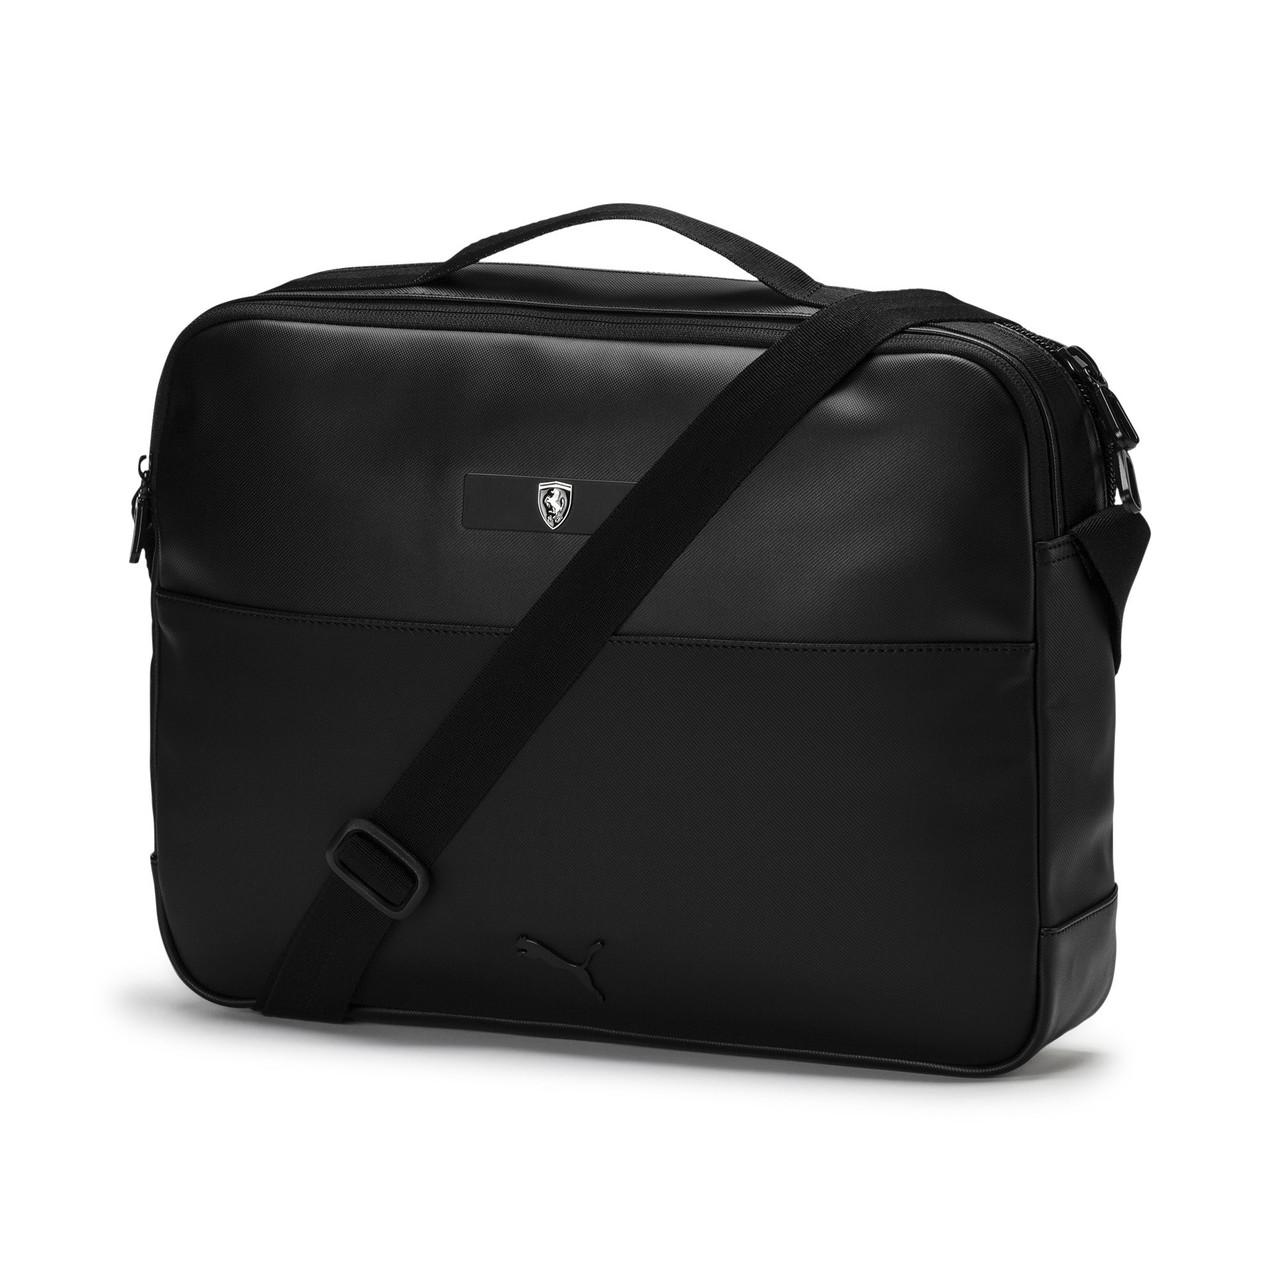 Спортивный сумка Puma SF LS Reporter